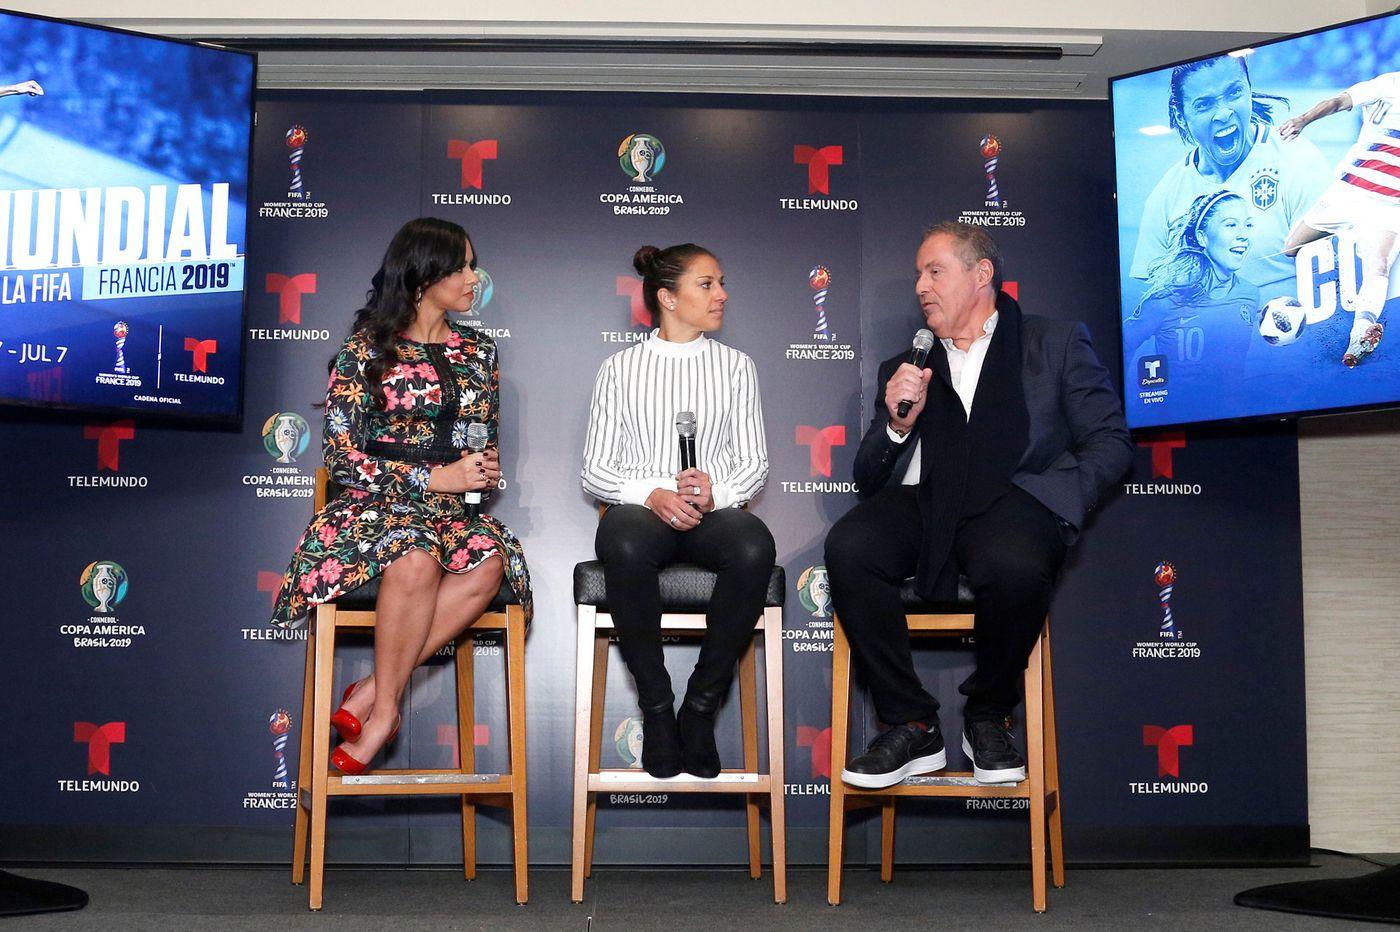 Telemundo unveils 2019 Women's World Cup, Copa América broadcast plans